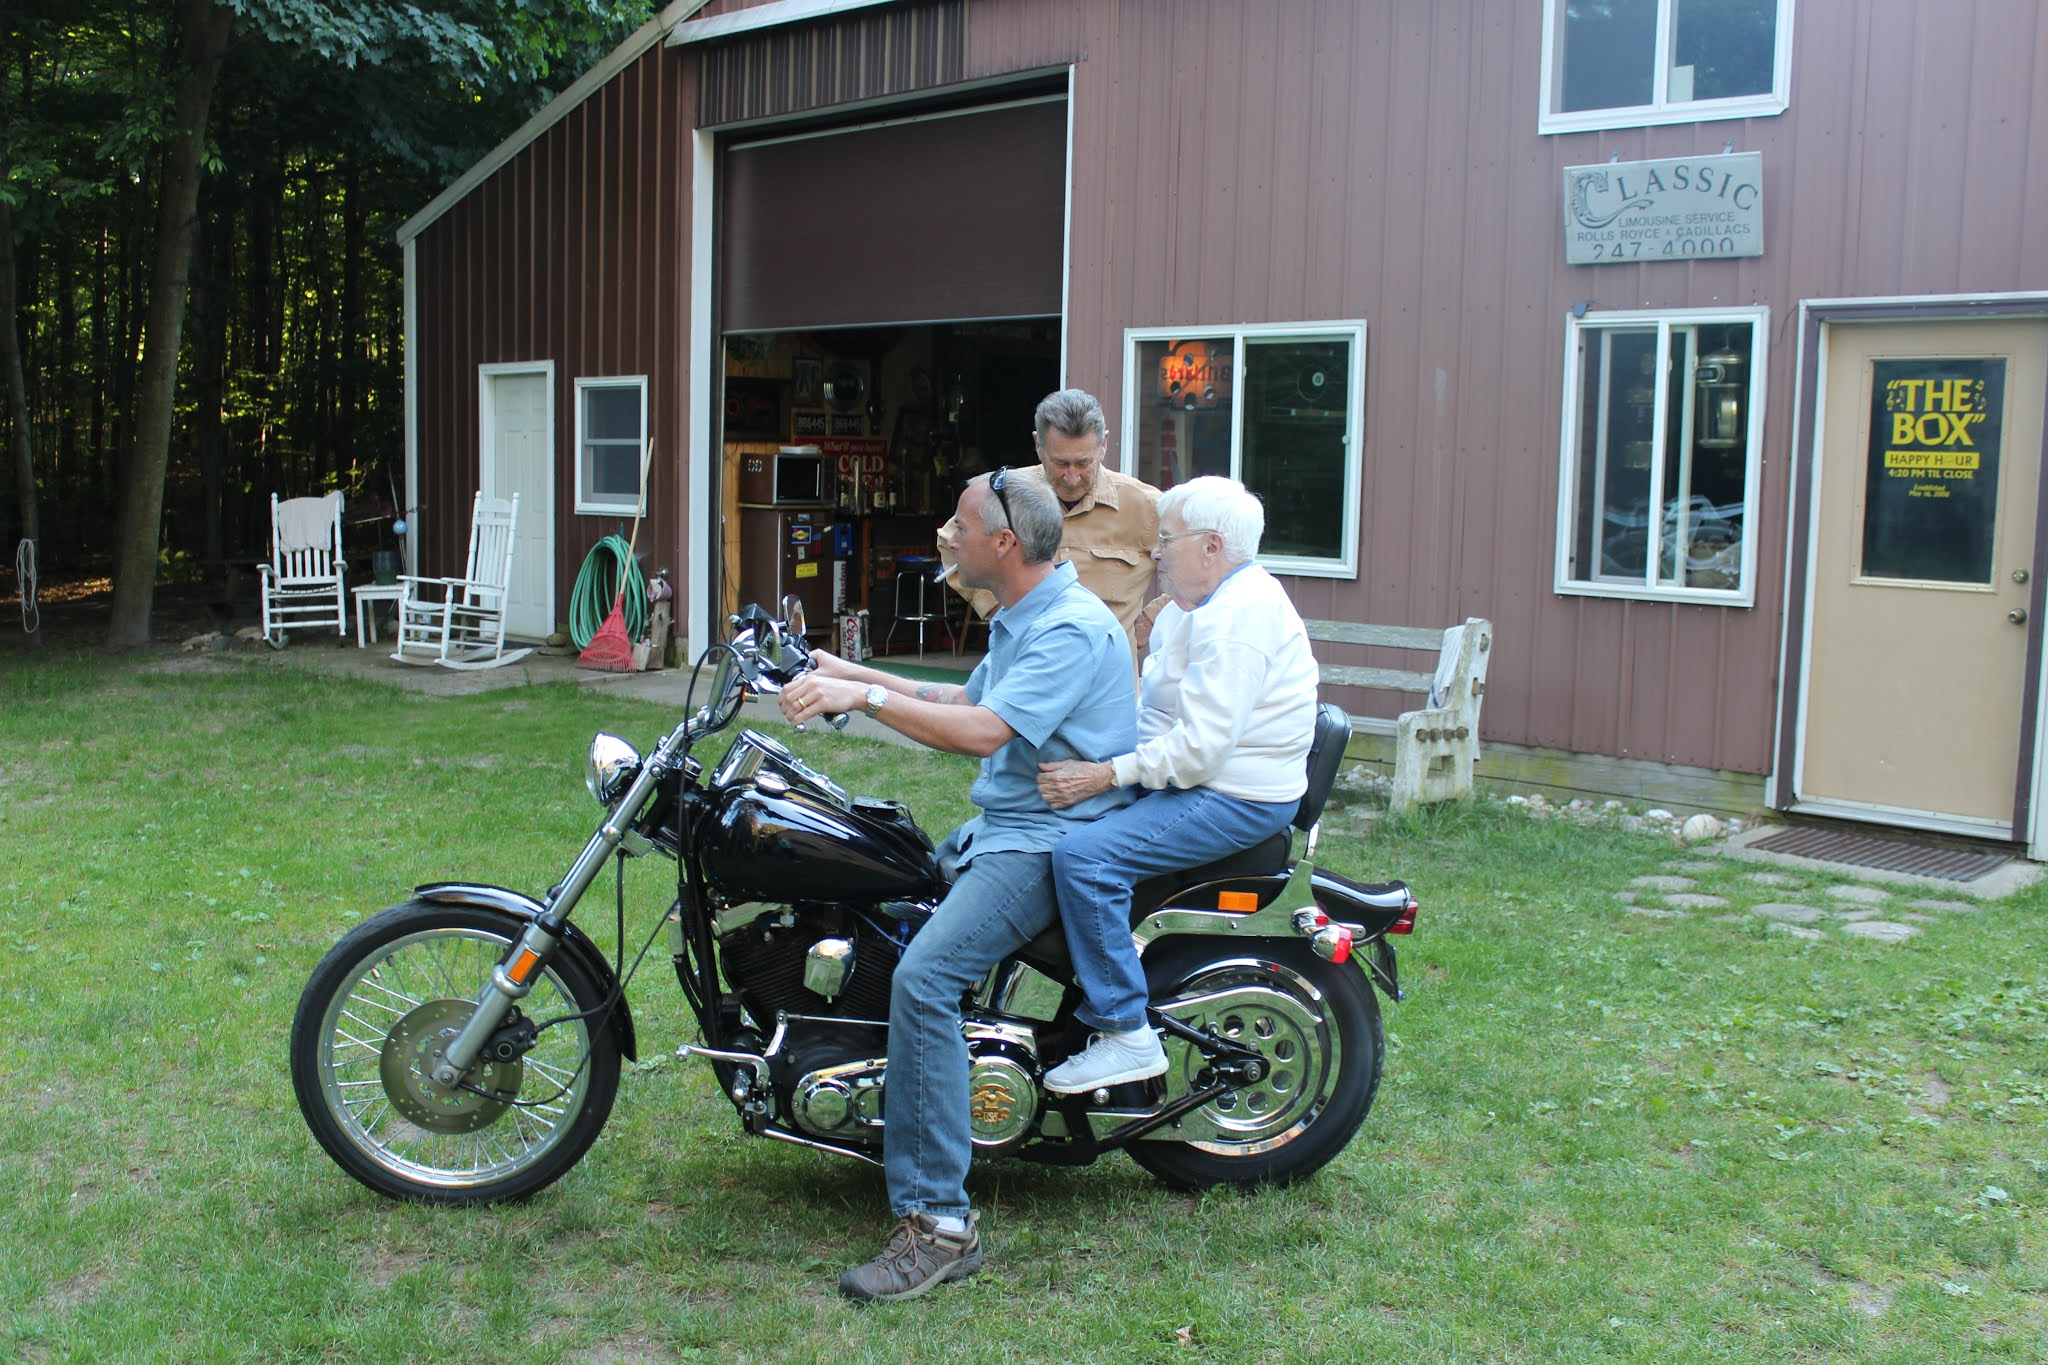 Grandma Rachel and Ryan Ride a Motorcycle